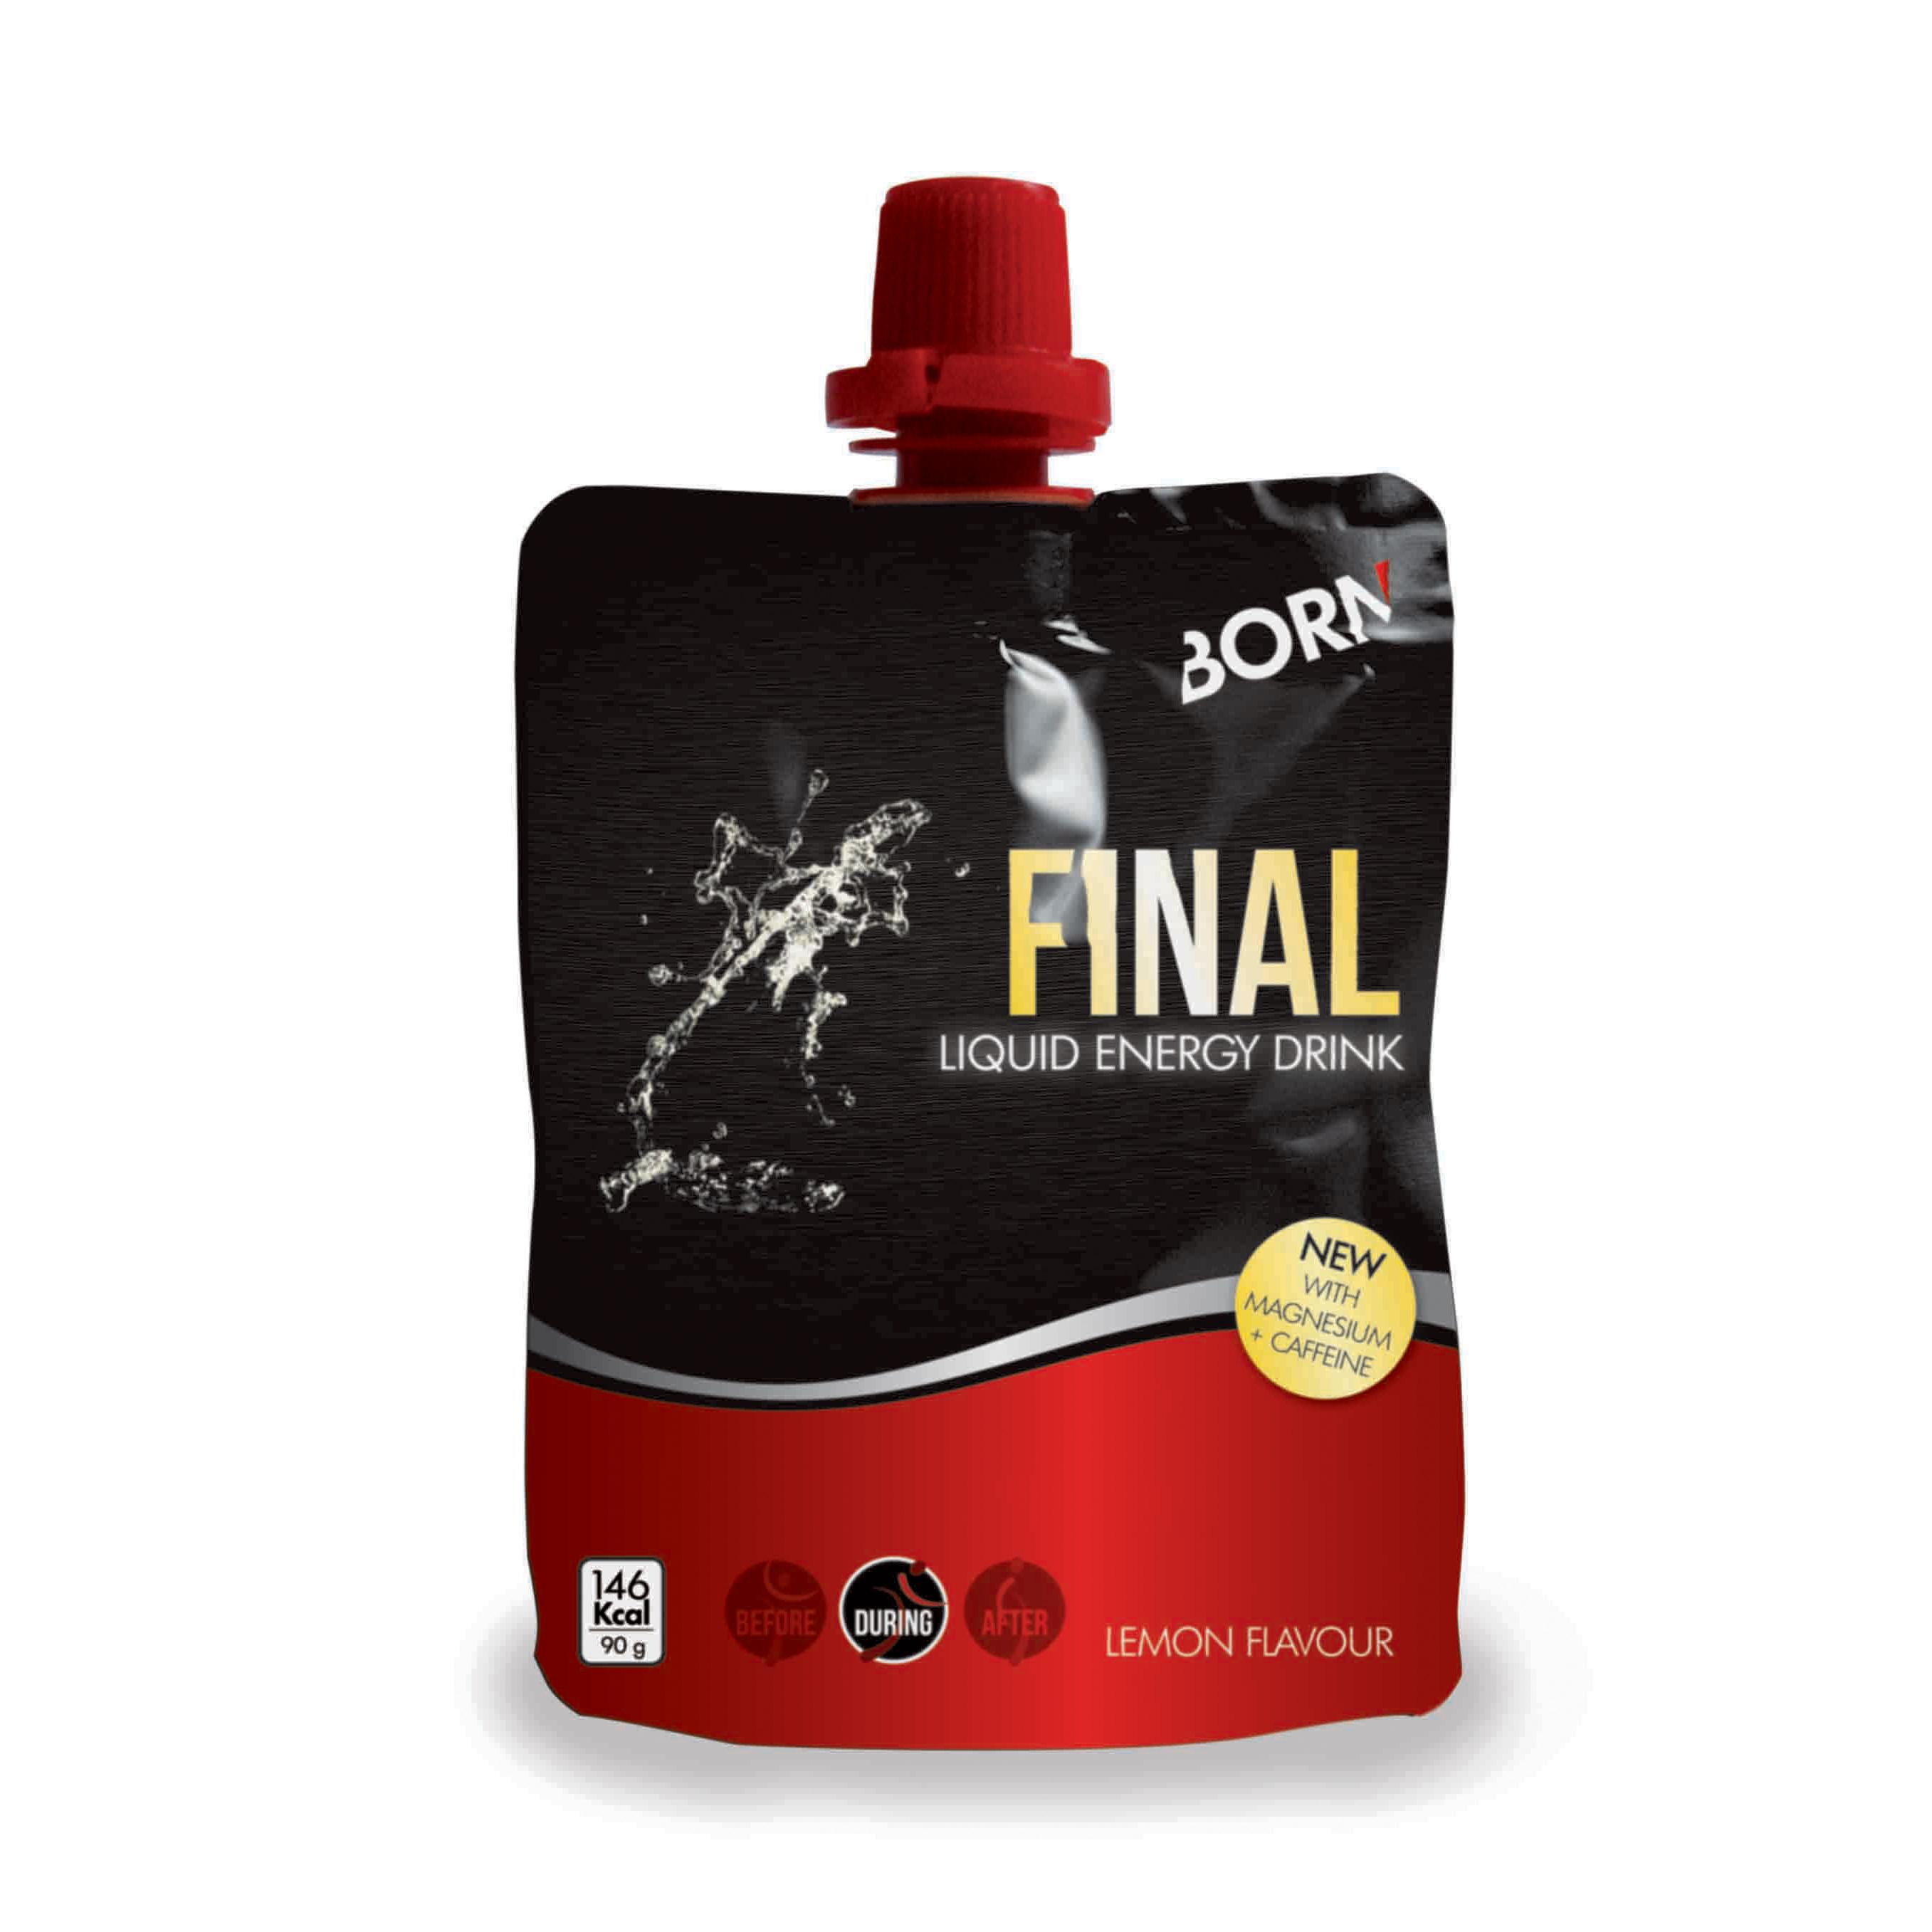 Born FINAL liquid energy drink